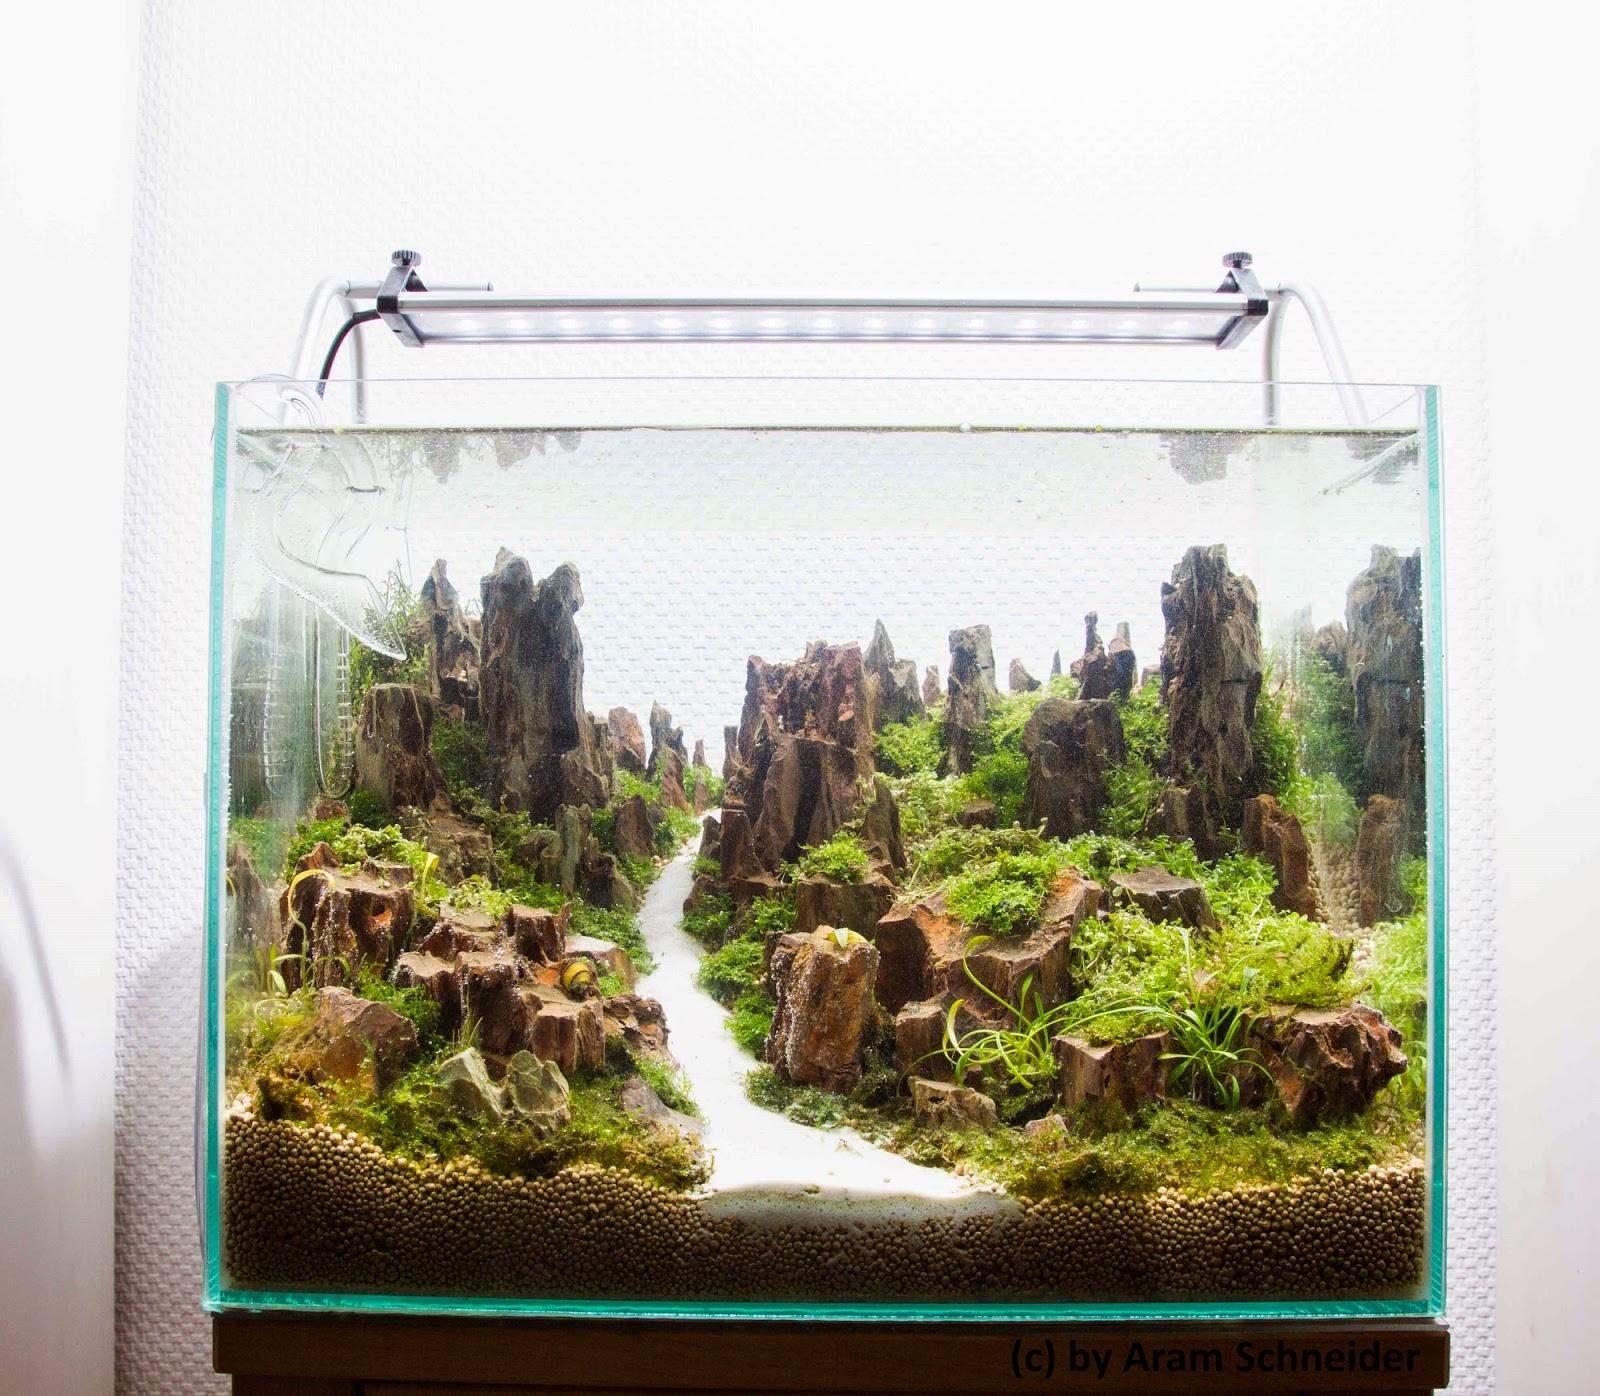 aram schneider aqua scaping 40x30x30cm becken geflutet. Black Bedroom Furniture Sets. Home Design Ideas